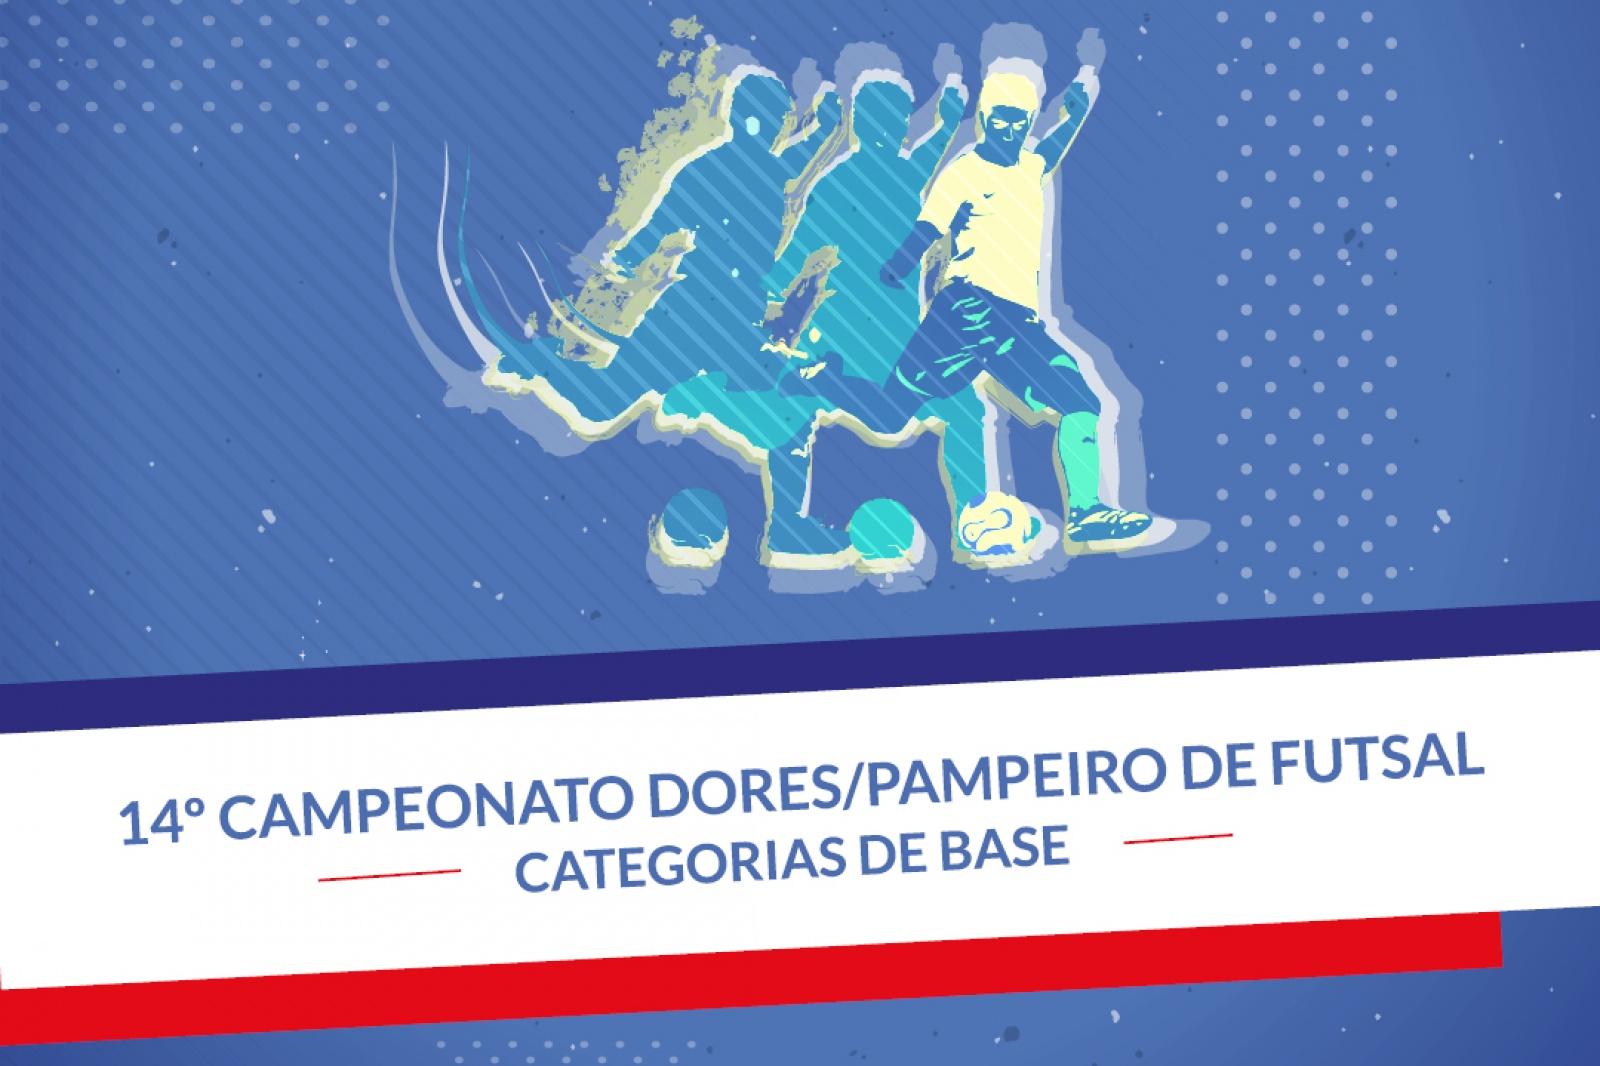 Abertura do Dores/Pampeiro de futsal transferido